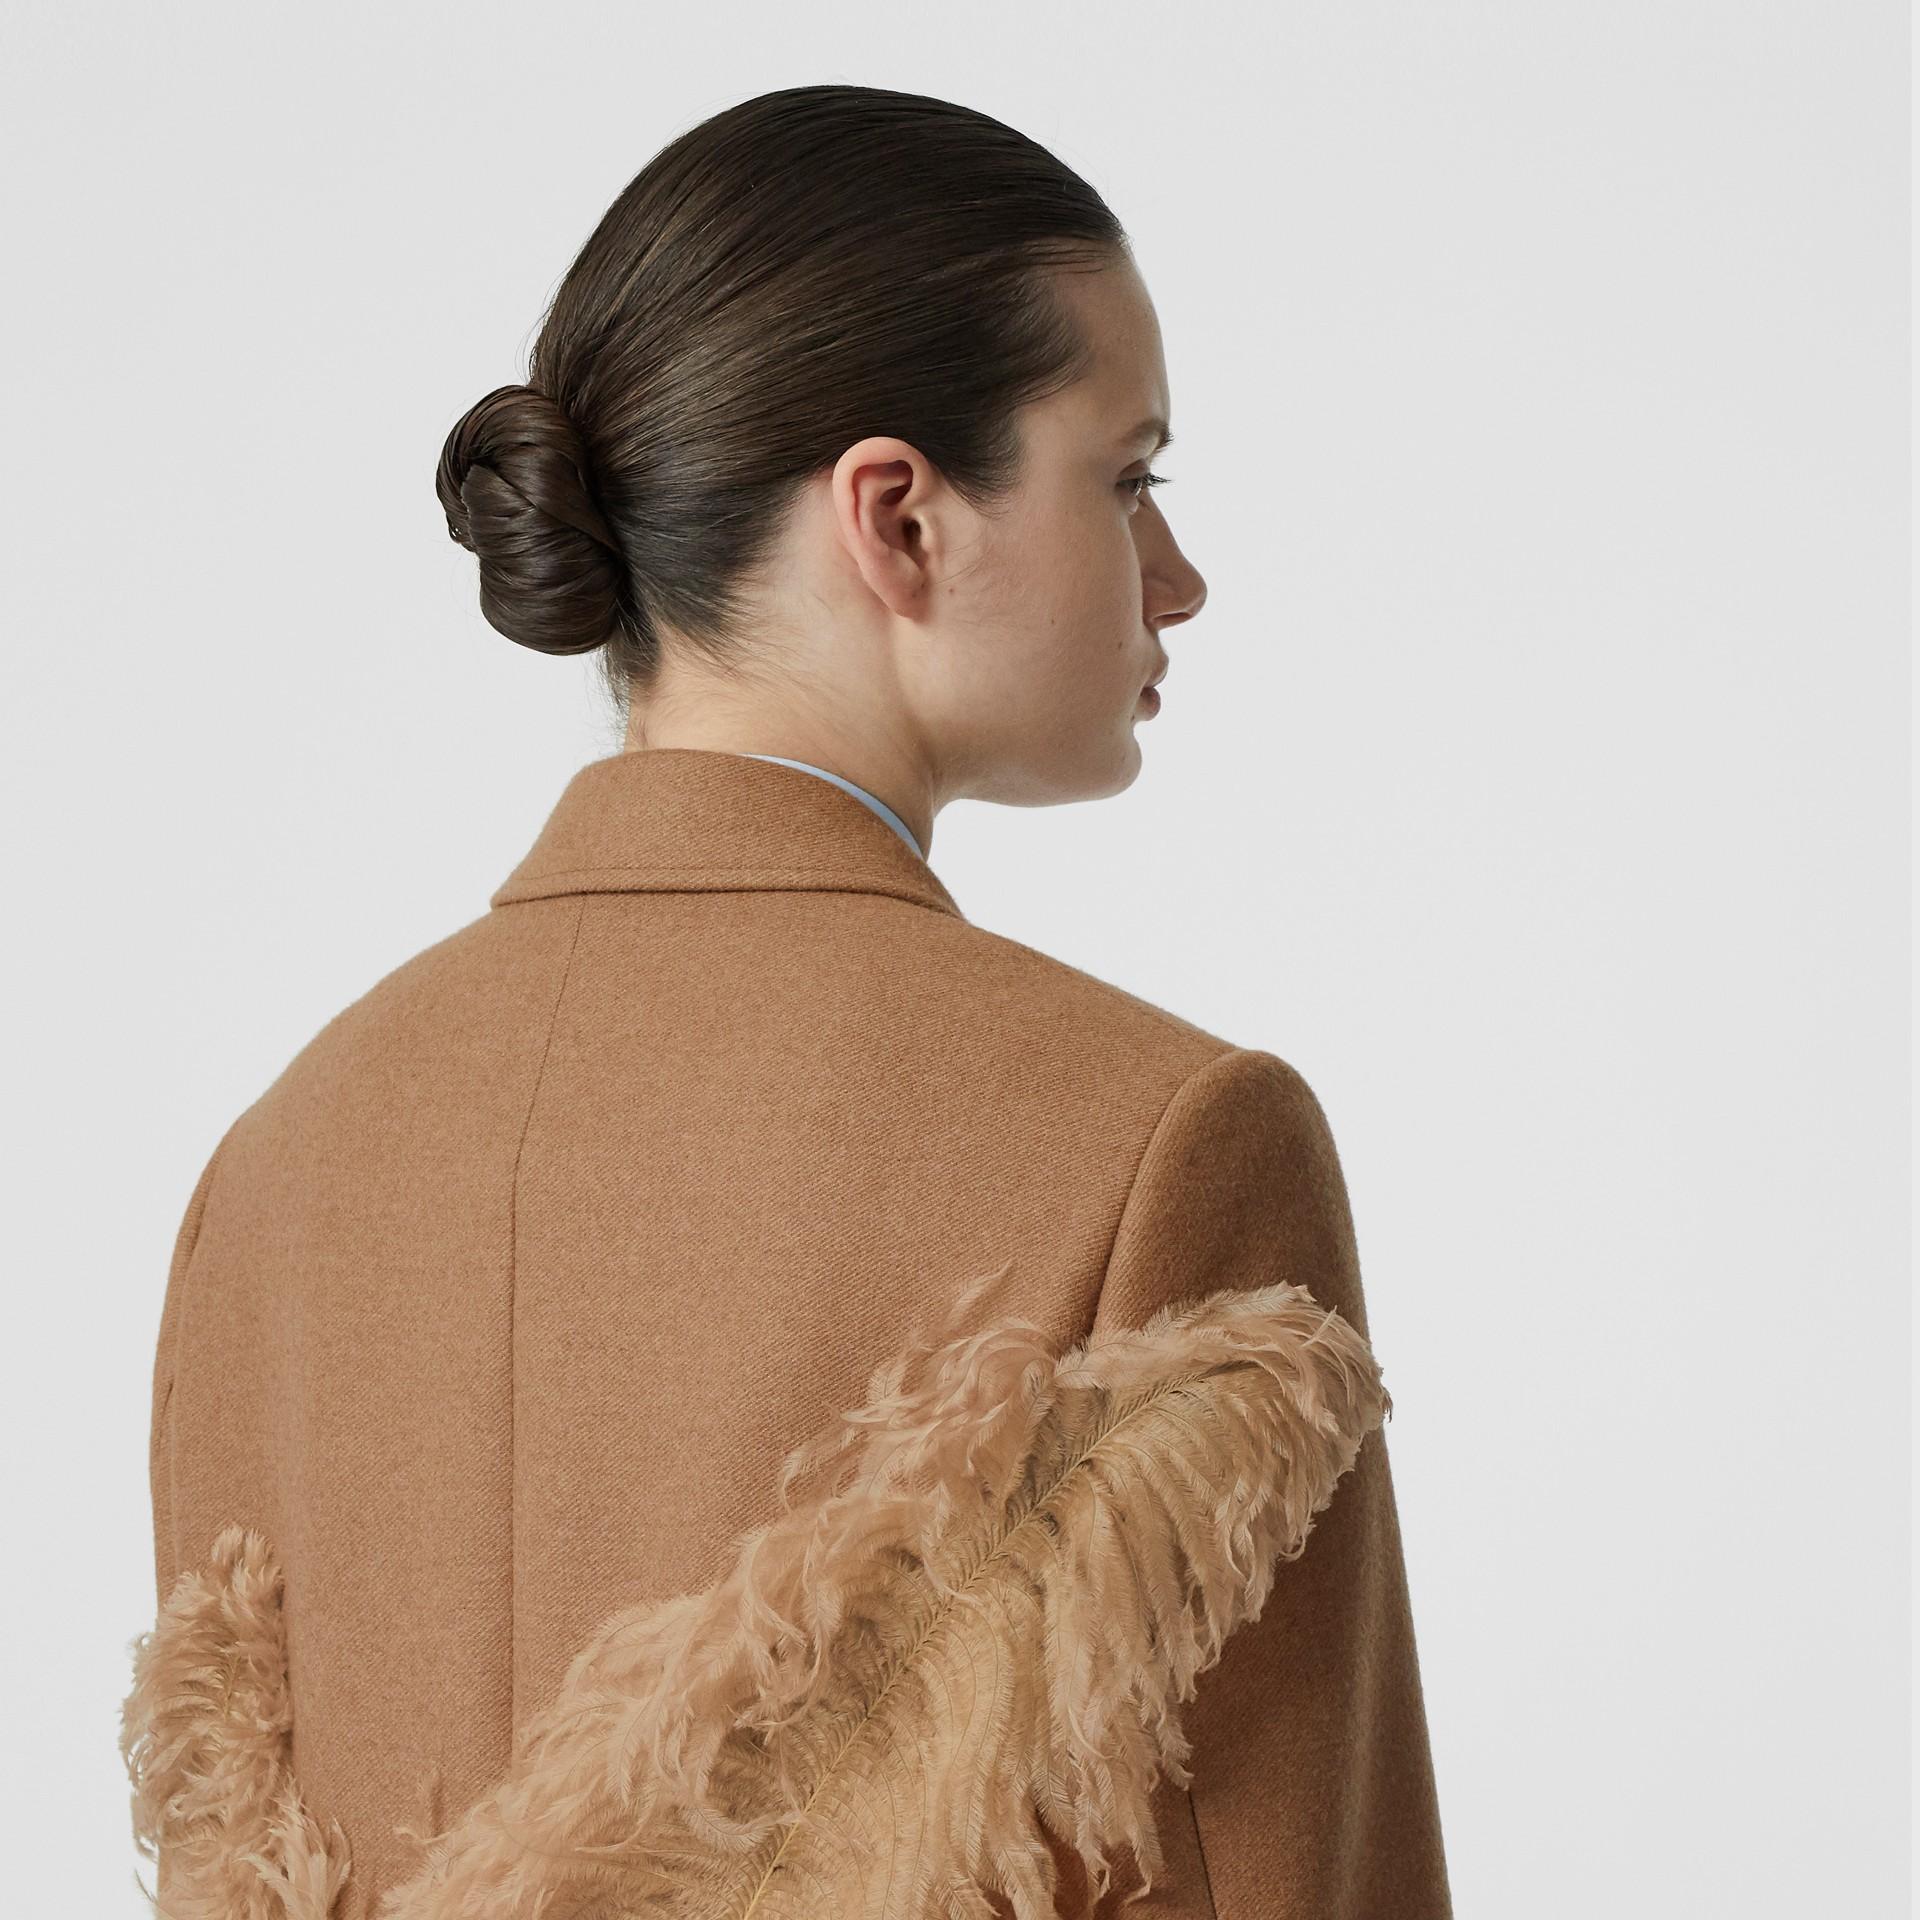 Abrigo de vestir en pelo de camello con detalle de plumas (Cámel) - Mujer | Burberry - imagen de la galería 5